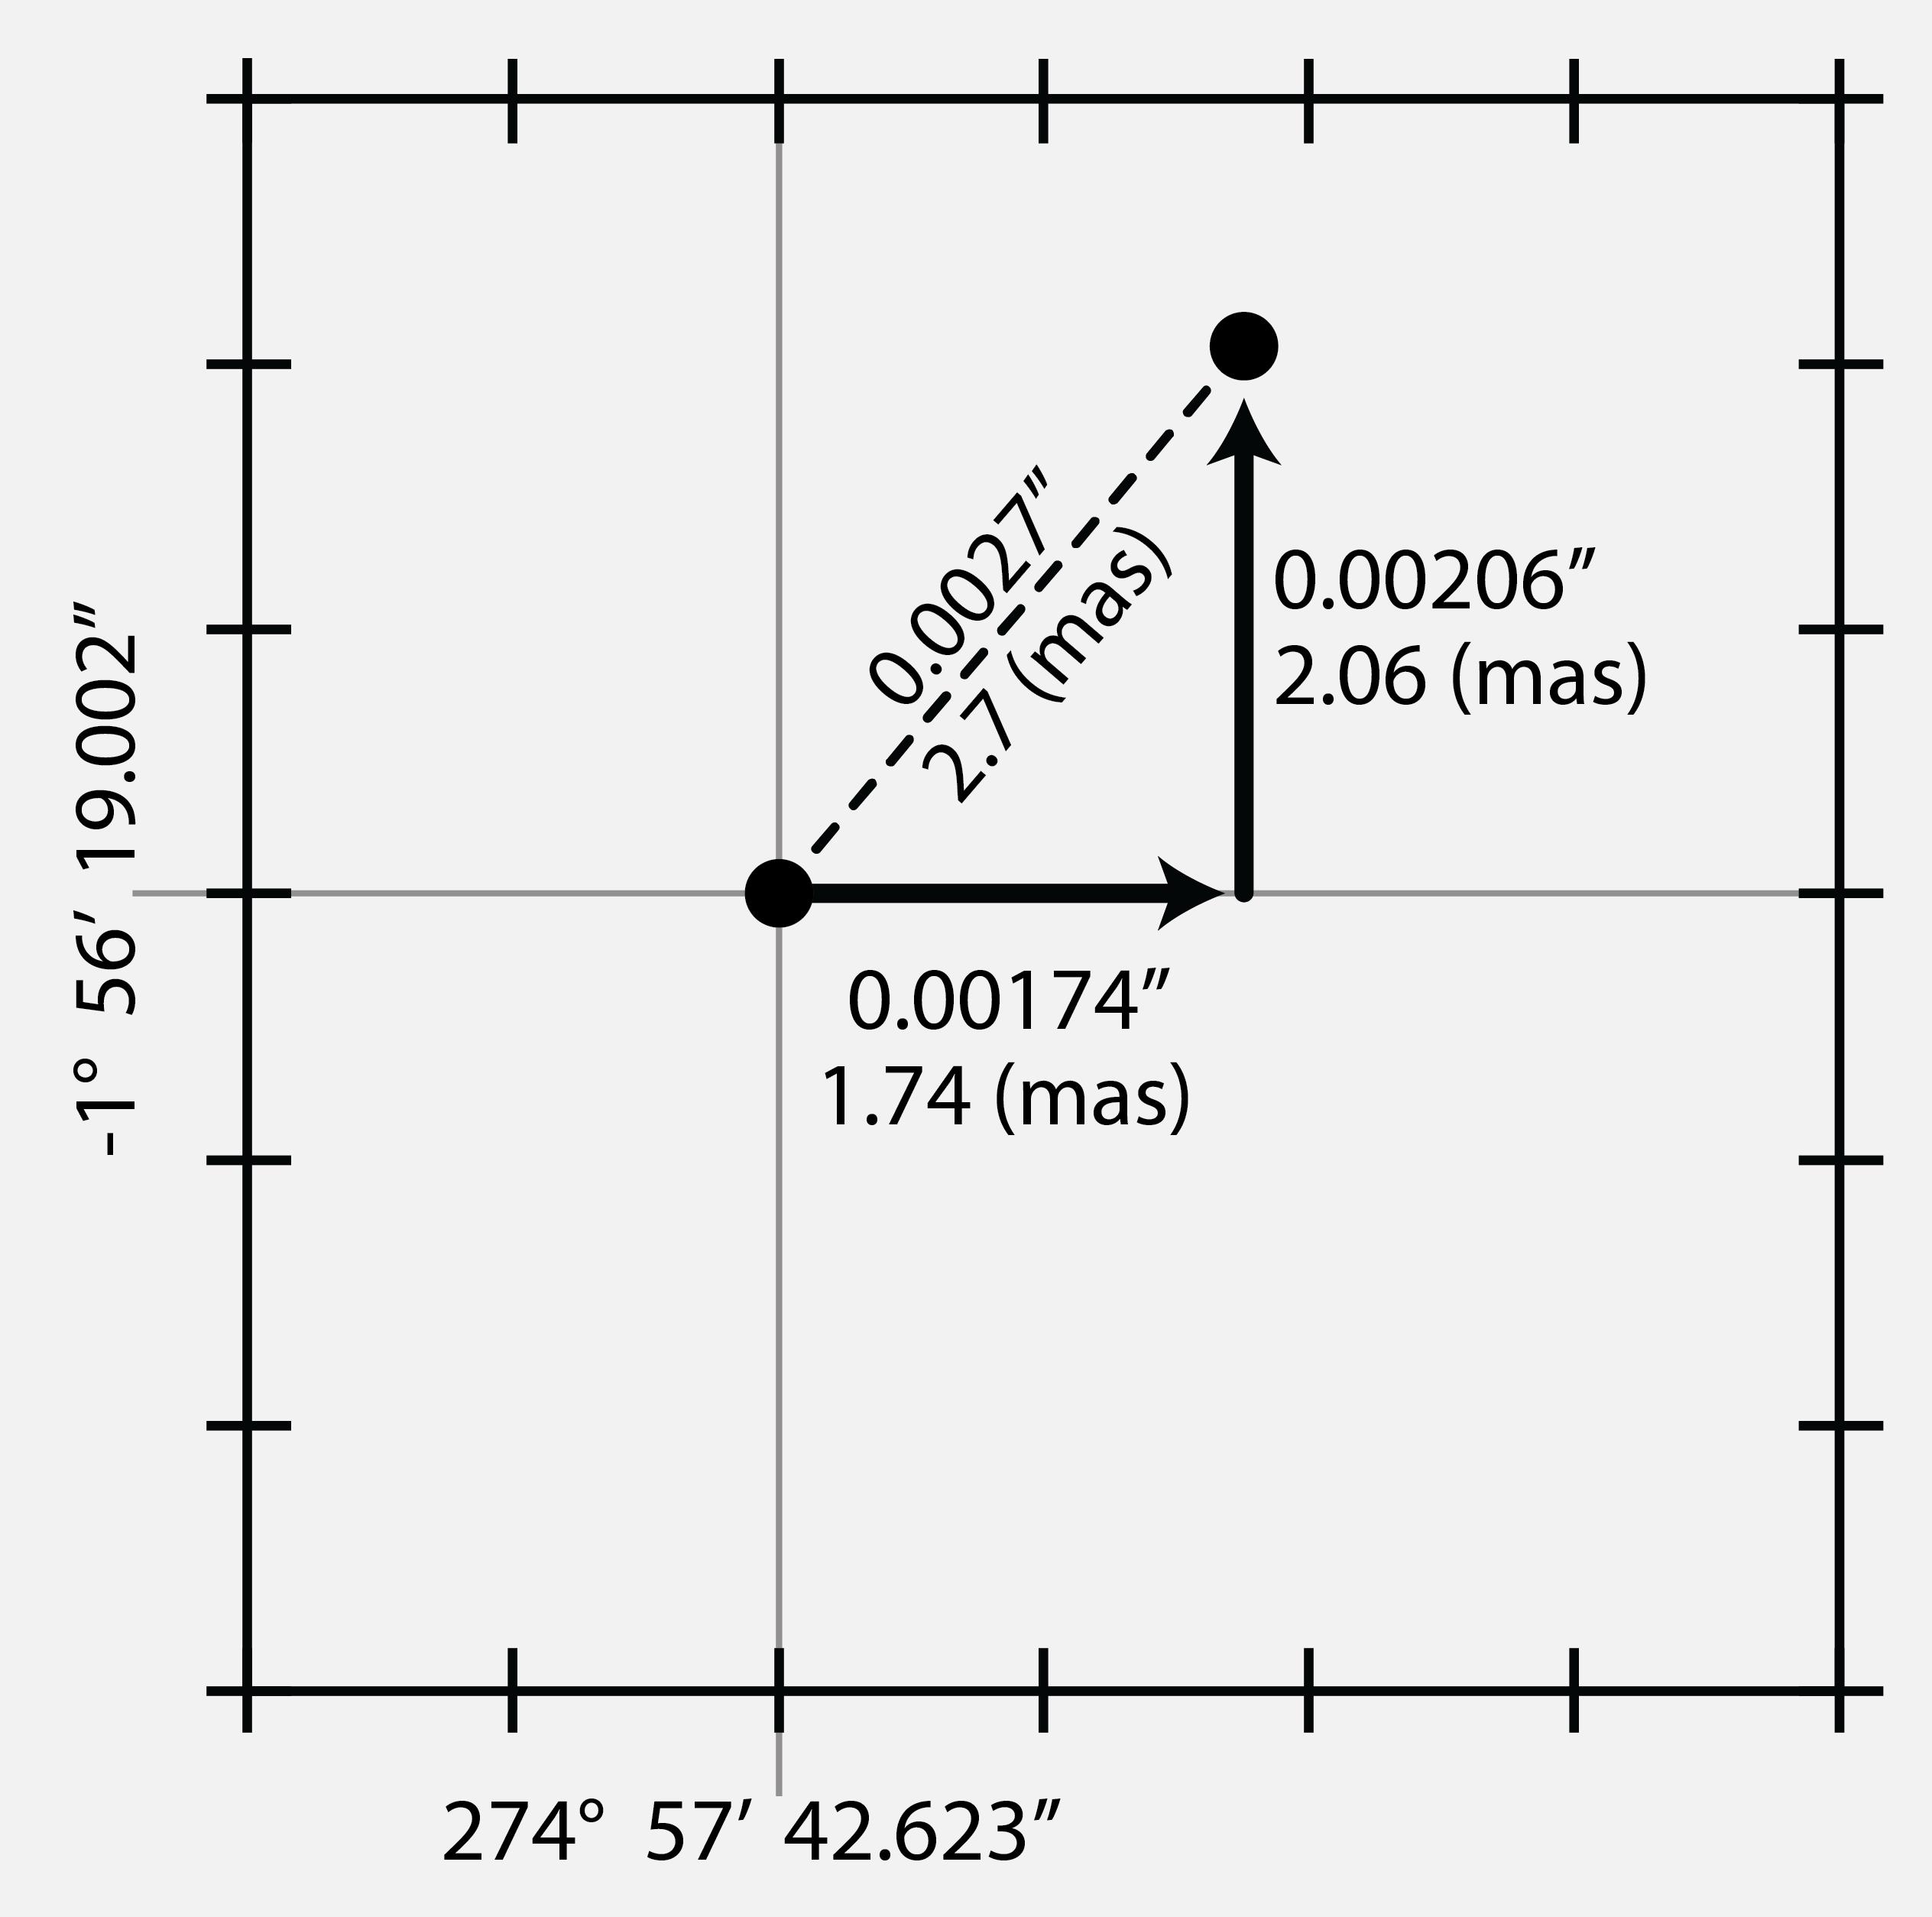 13-Gliese_710-proper_motion.png